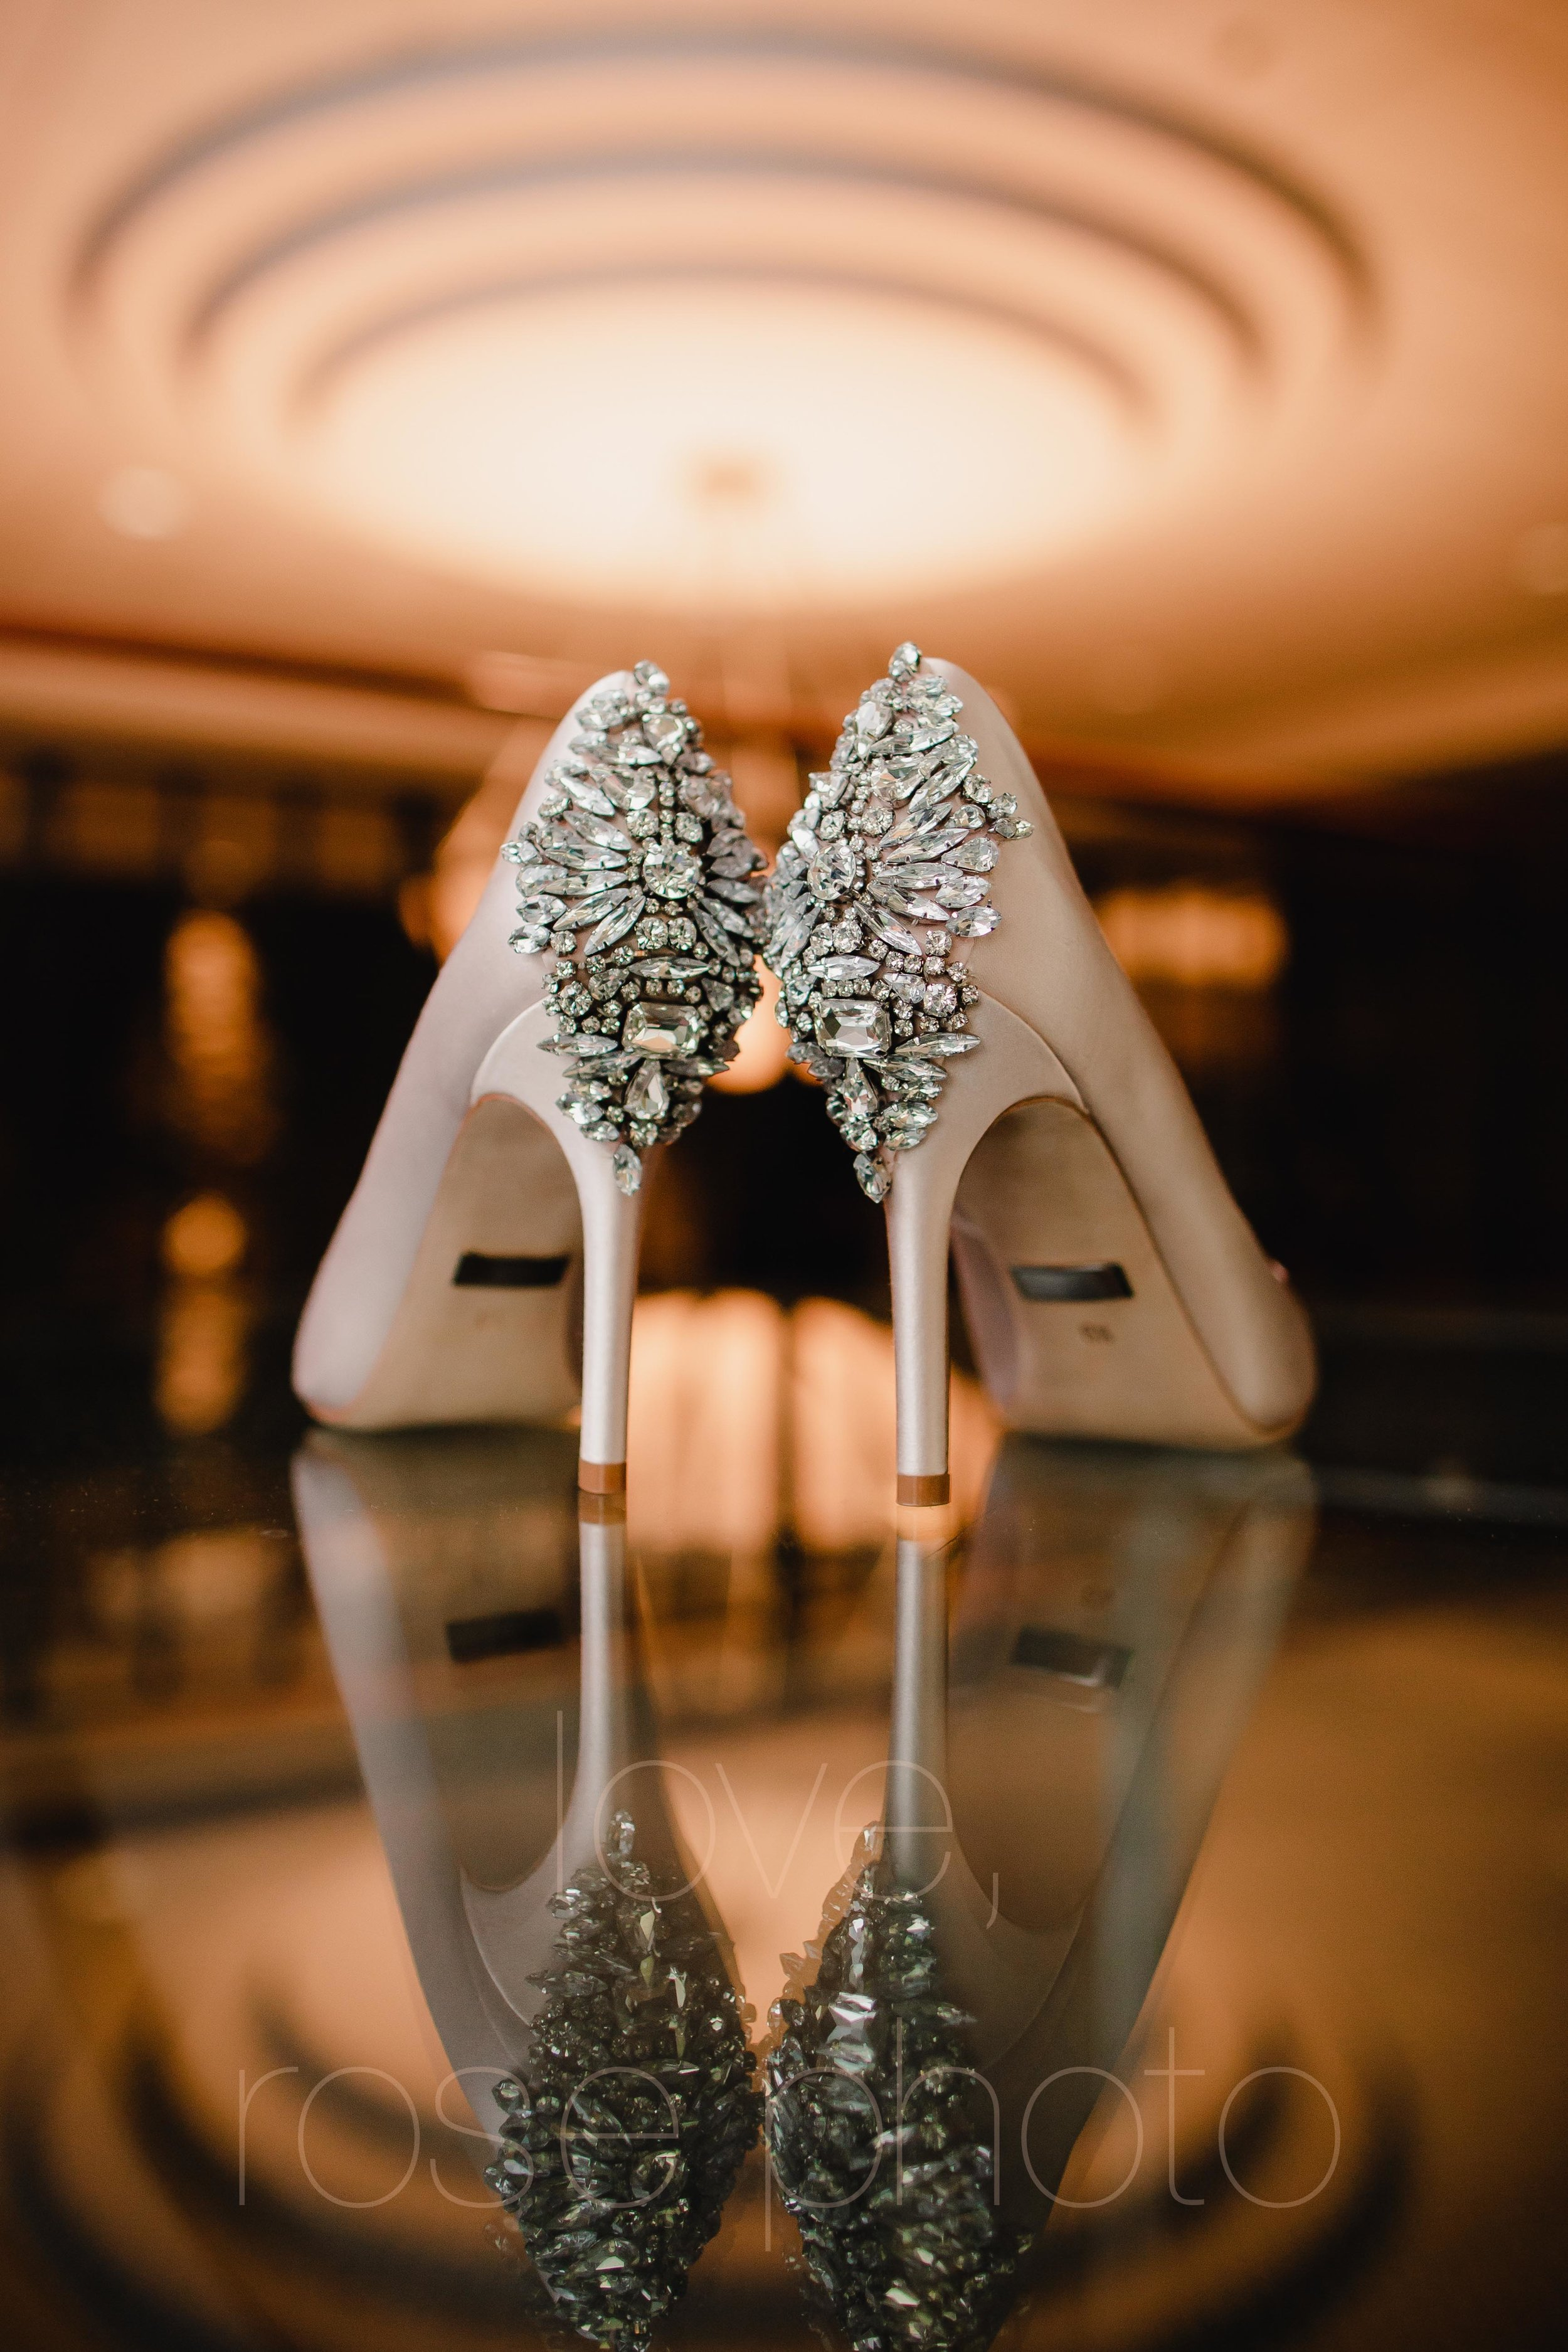 Chicago Indian Wedding best photography lifestyle wedding portrait luxury wedding-1.jpg